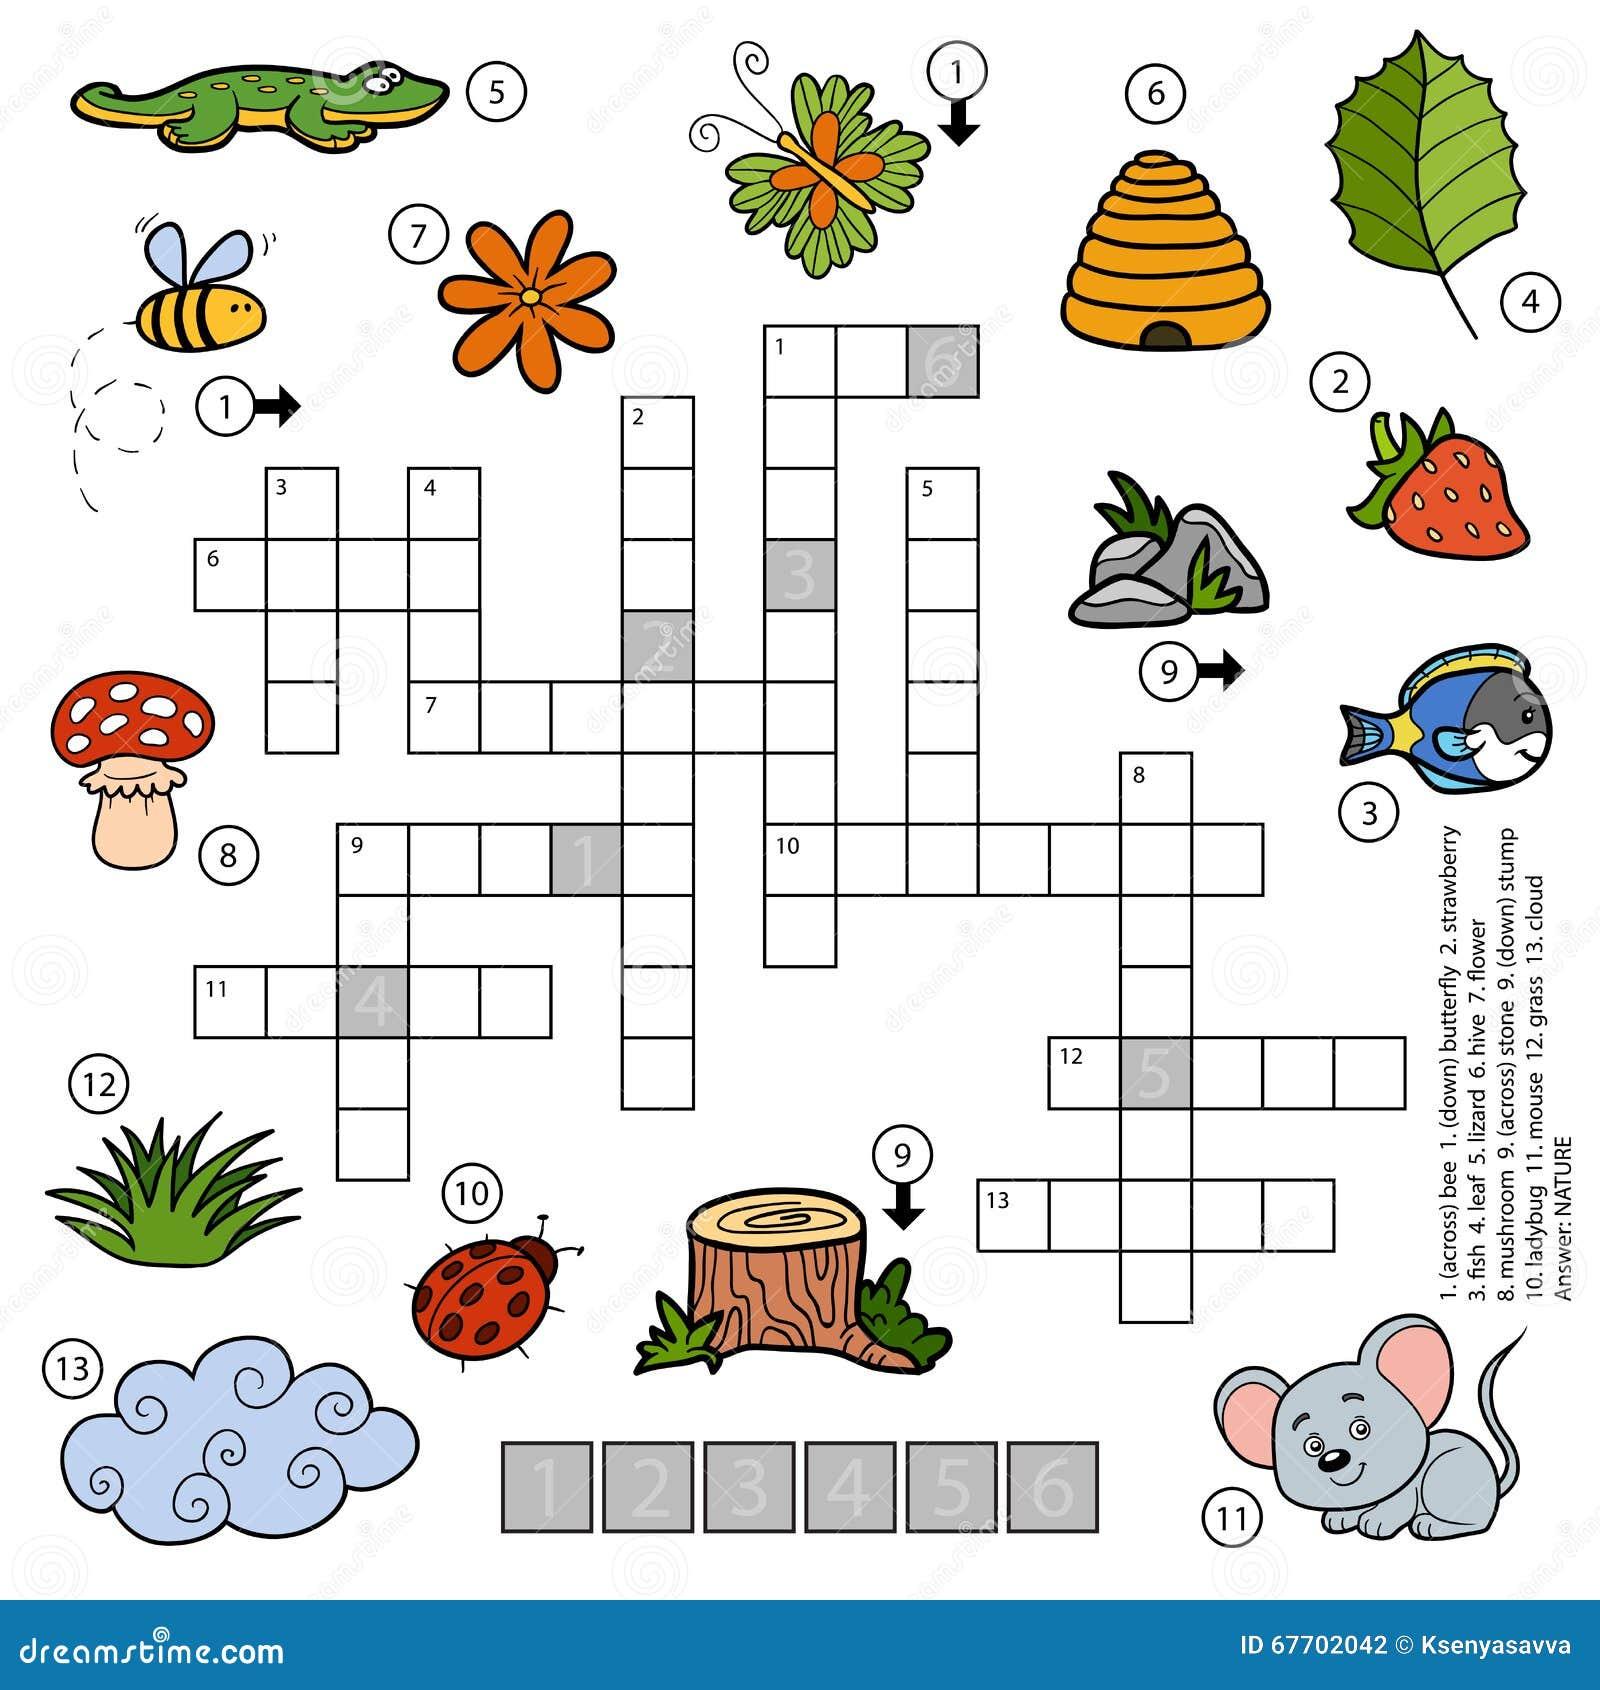 vector color crossword for children about nature stock vector illustration of colorful leaf. Black Bedroom Furniture Sets. Home Design Ideas